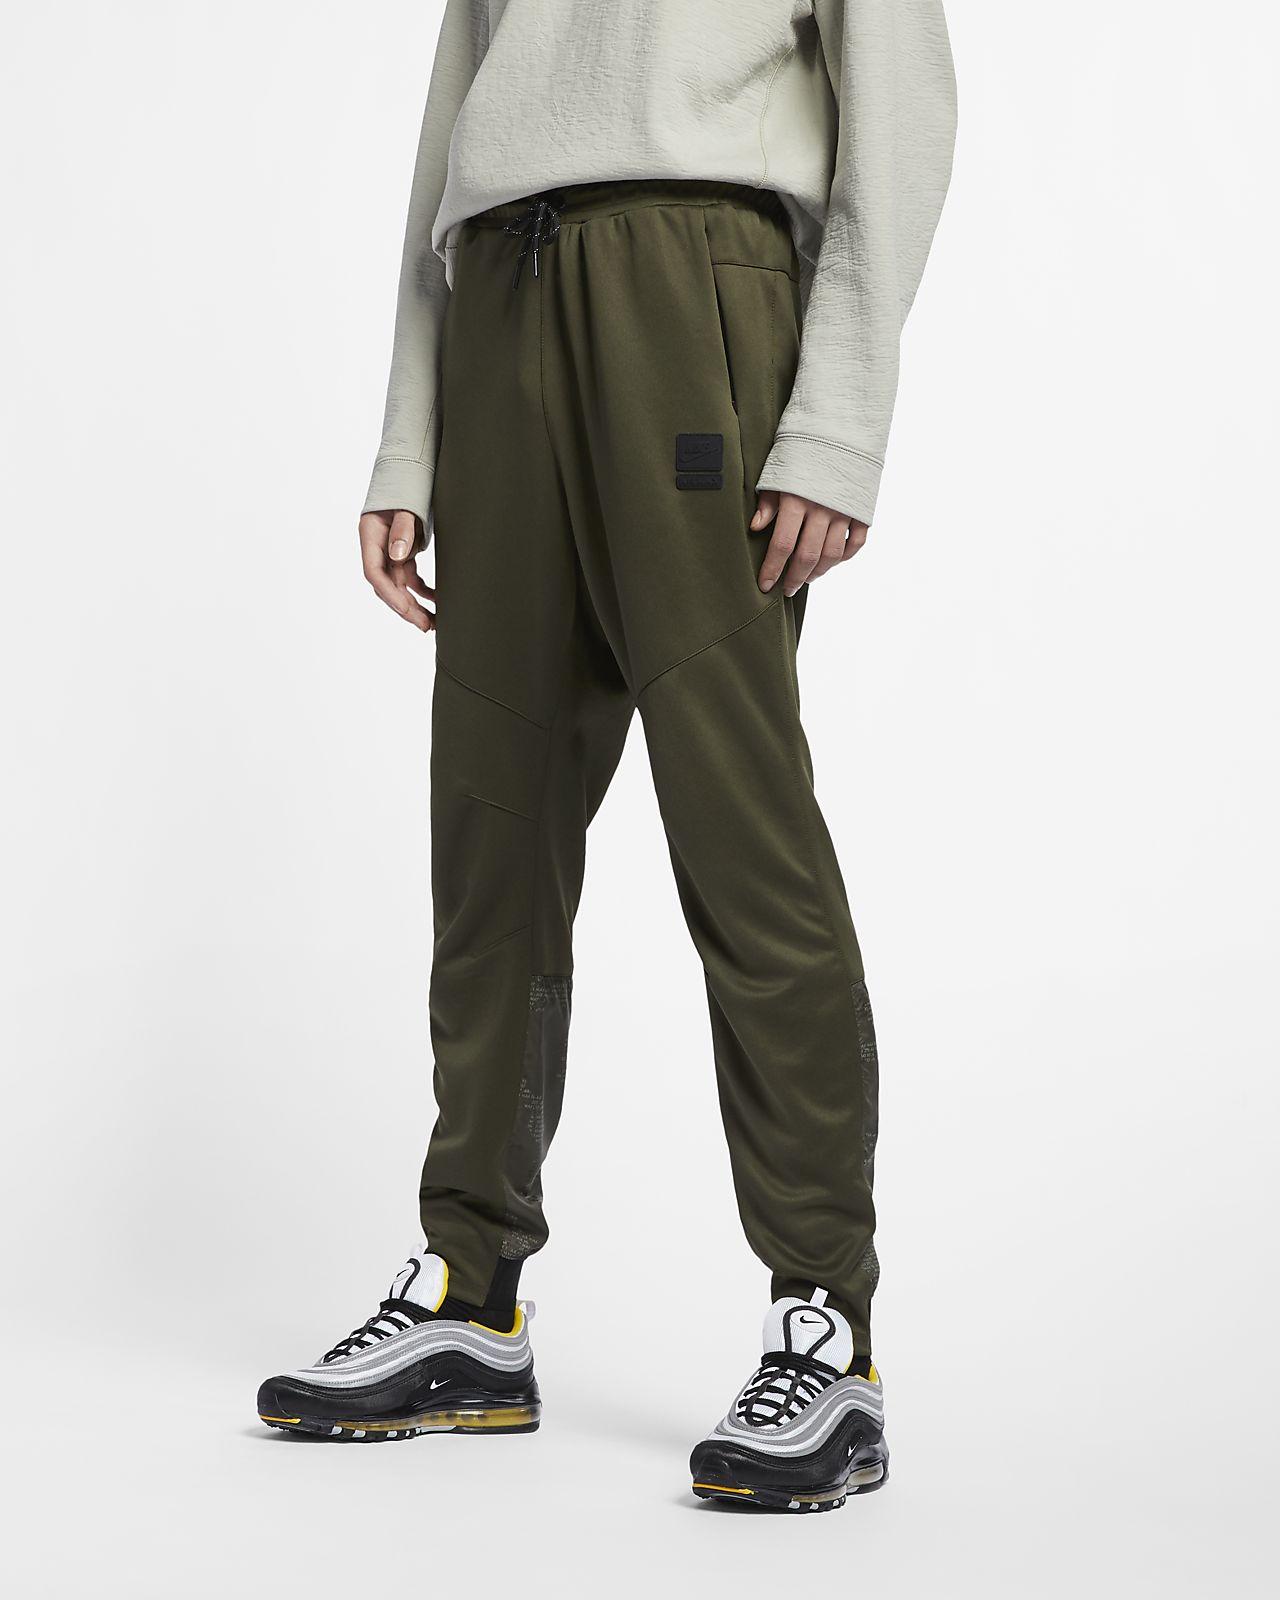 new concept where to buy 50% off Pantalon de jogging Nike Air Max pour Homme